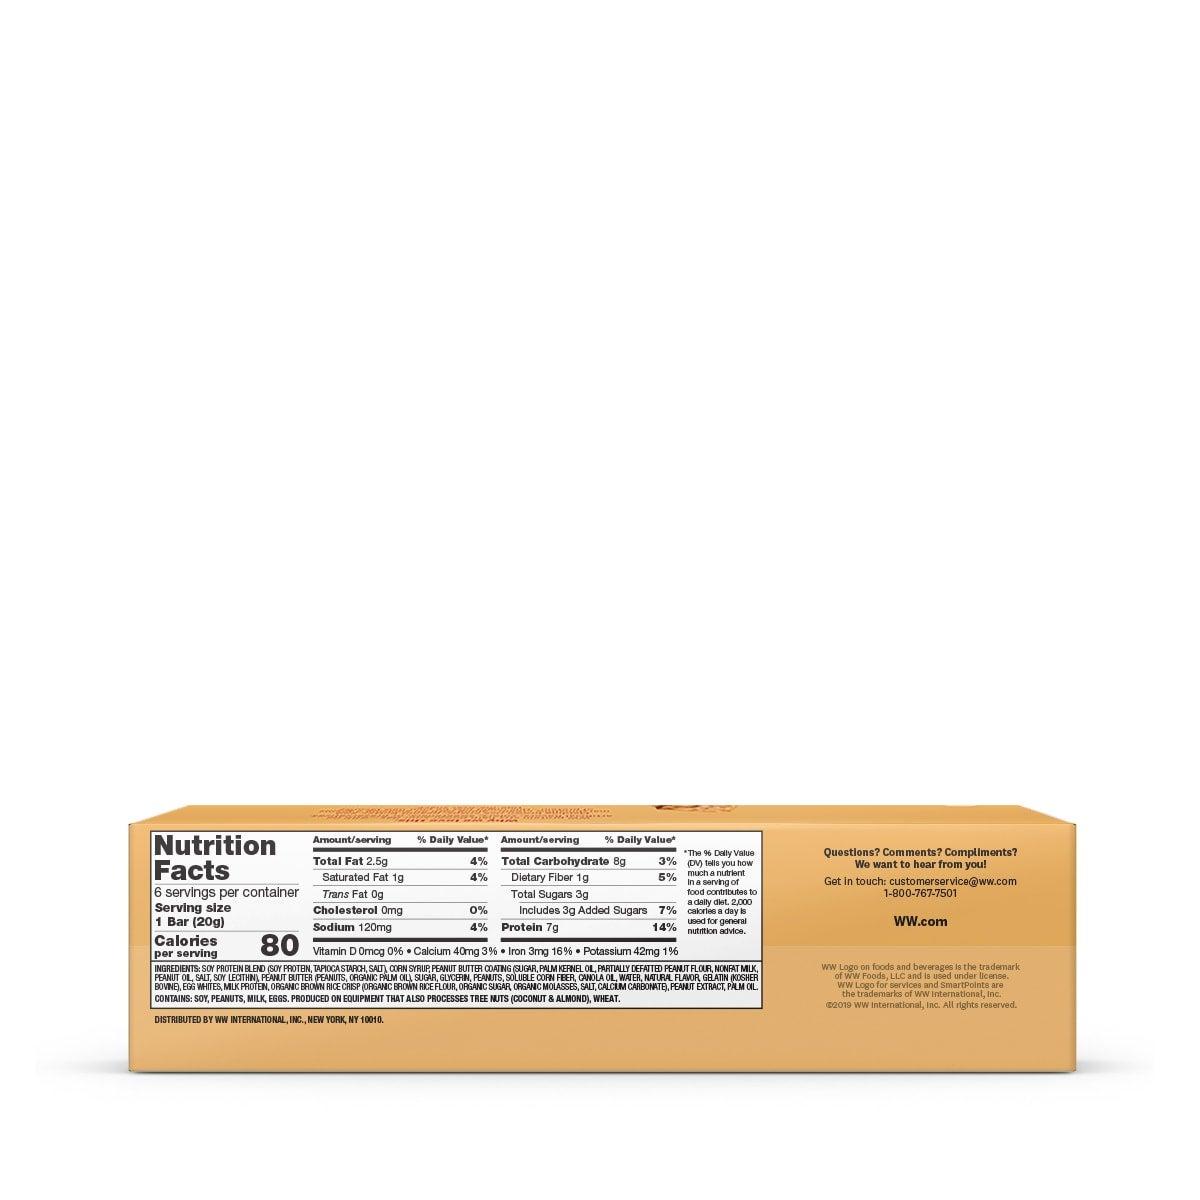 Peanut Butter Protein Stix - back of box